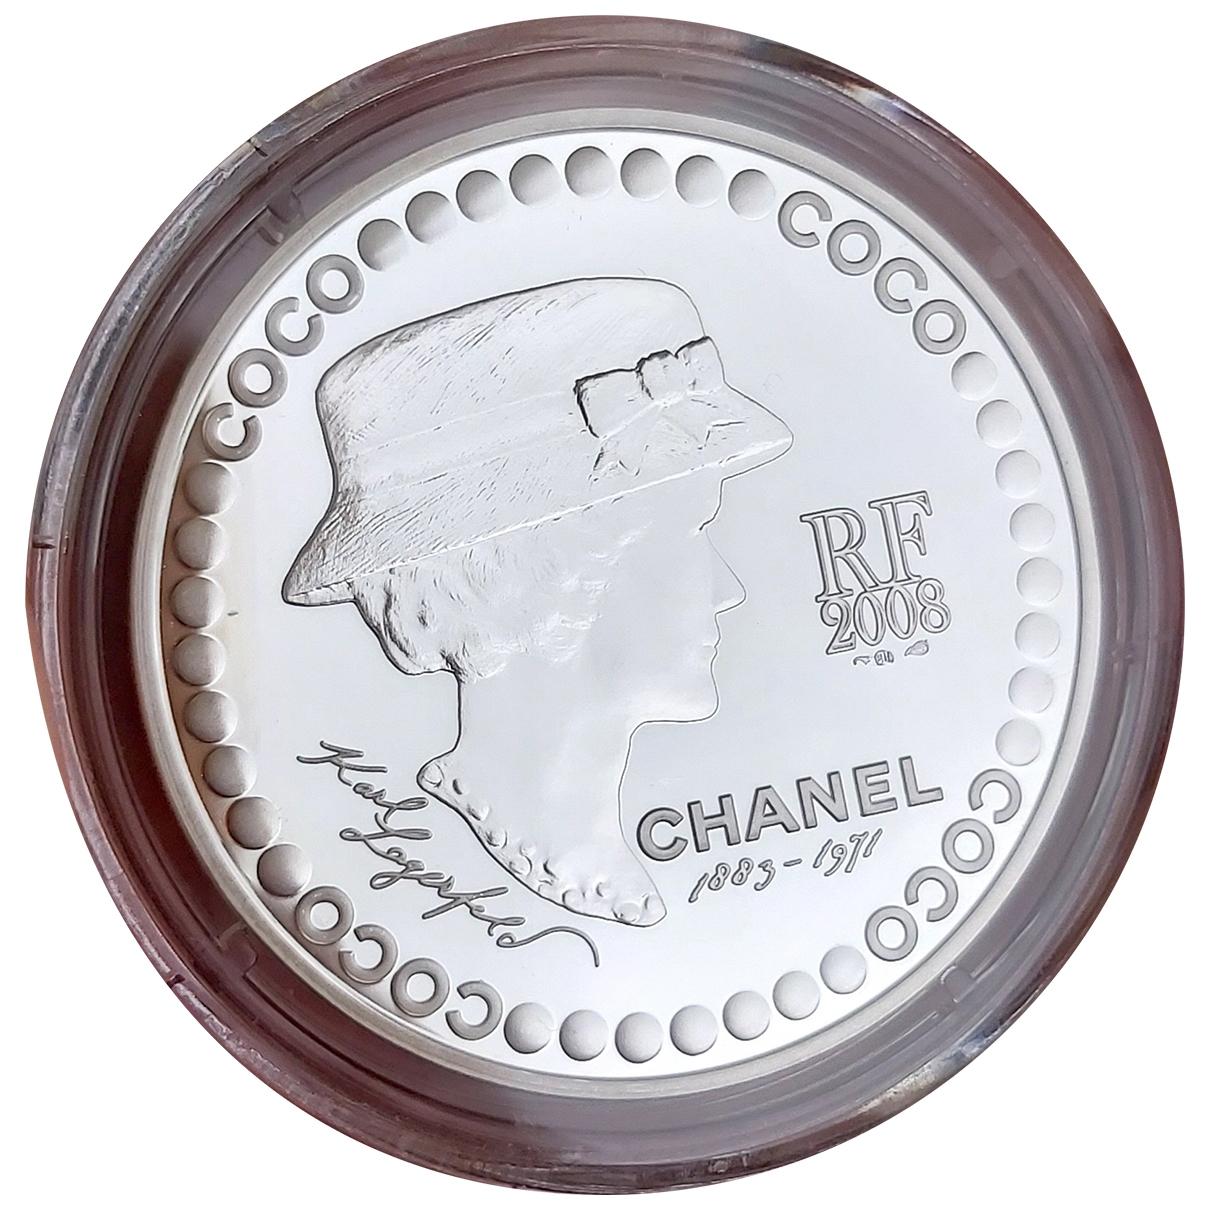 Objeto de decoracion de Plata Chanel